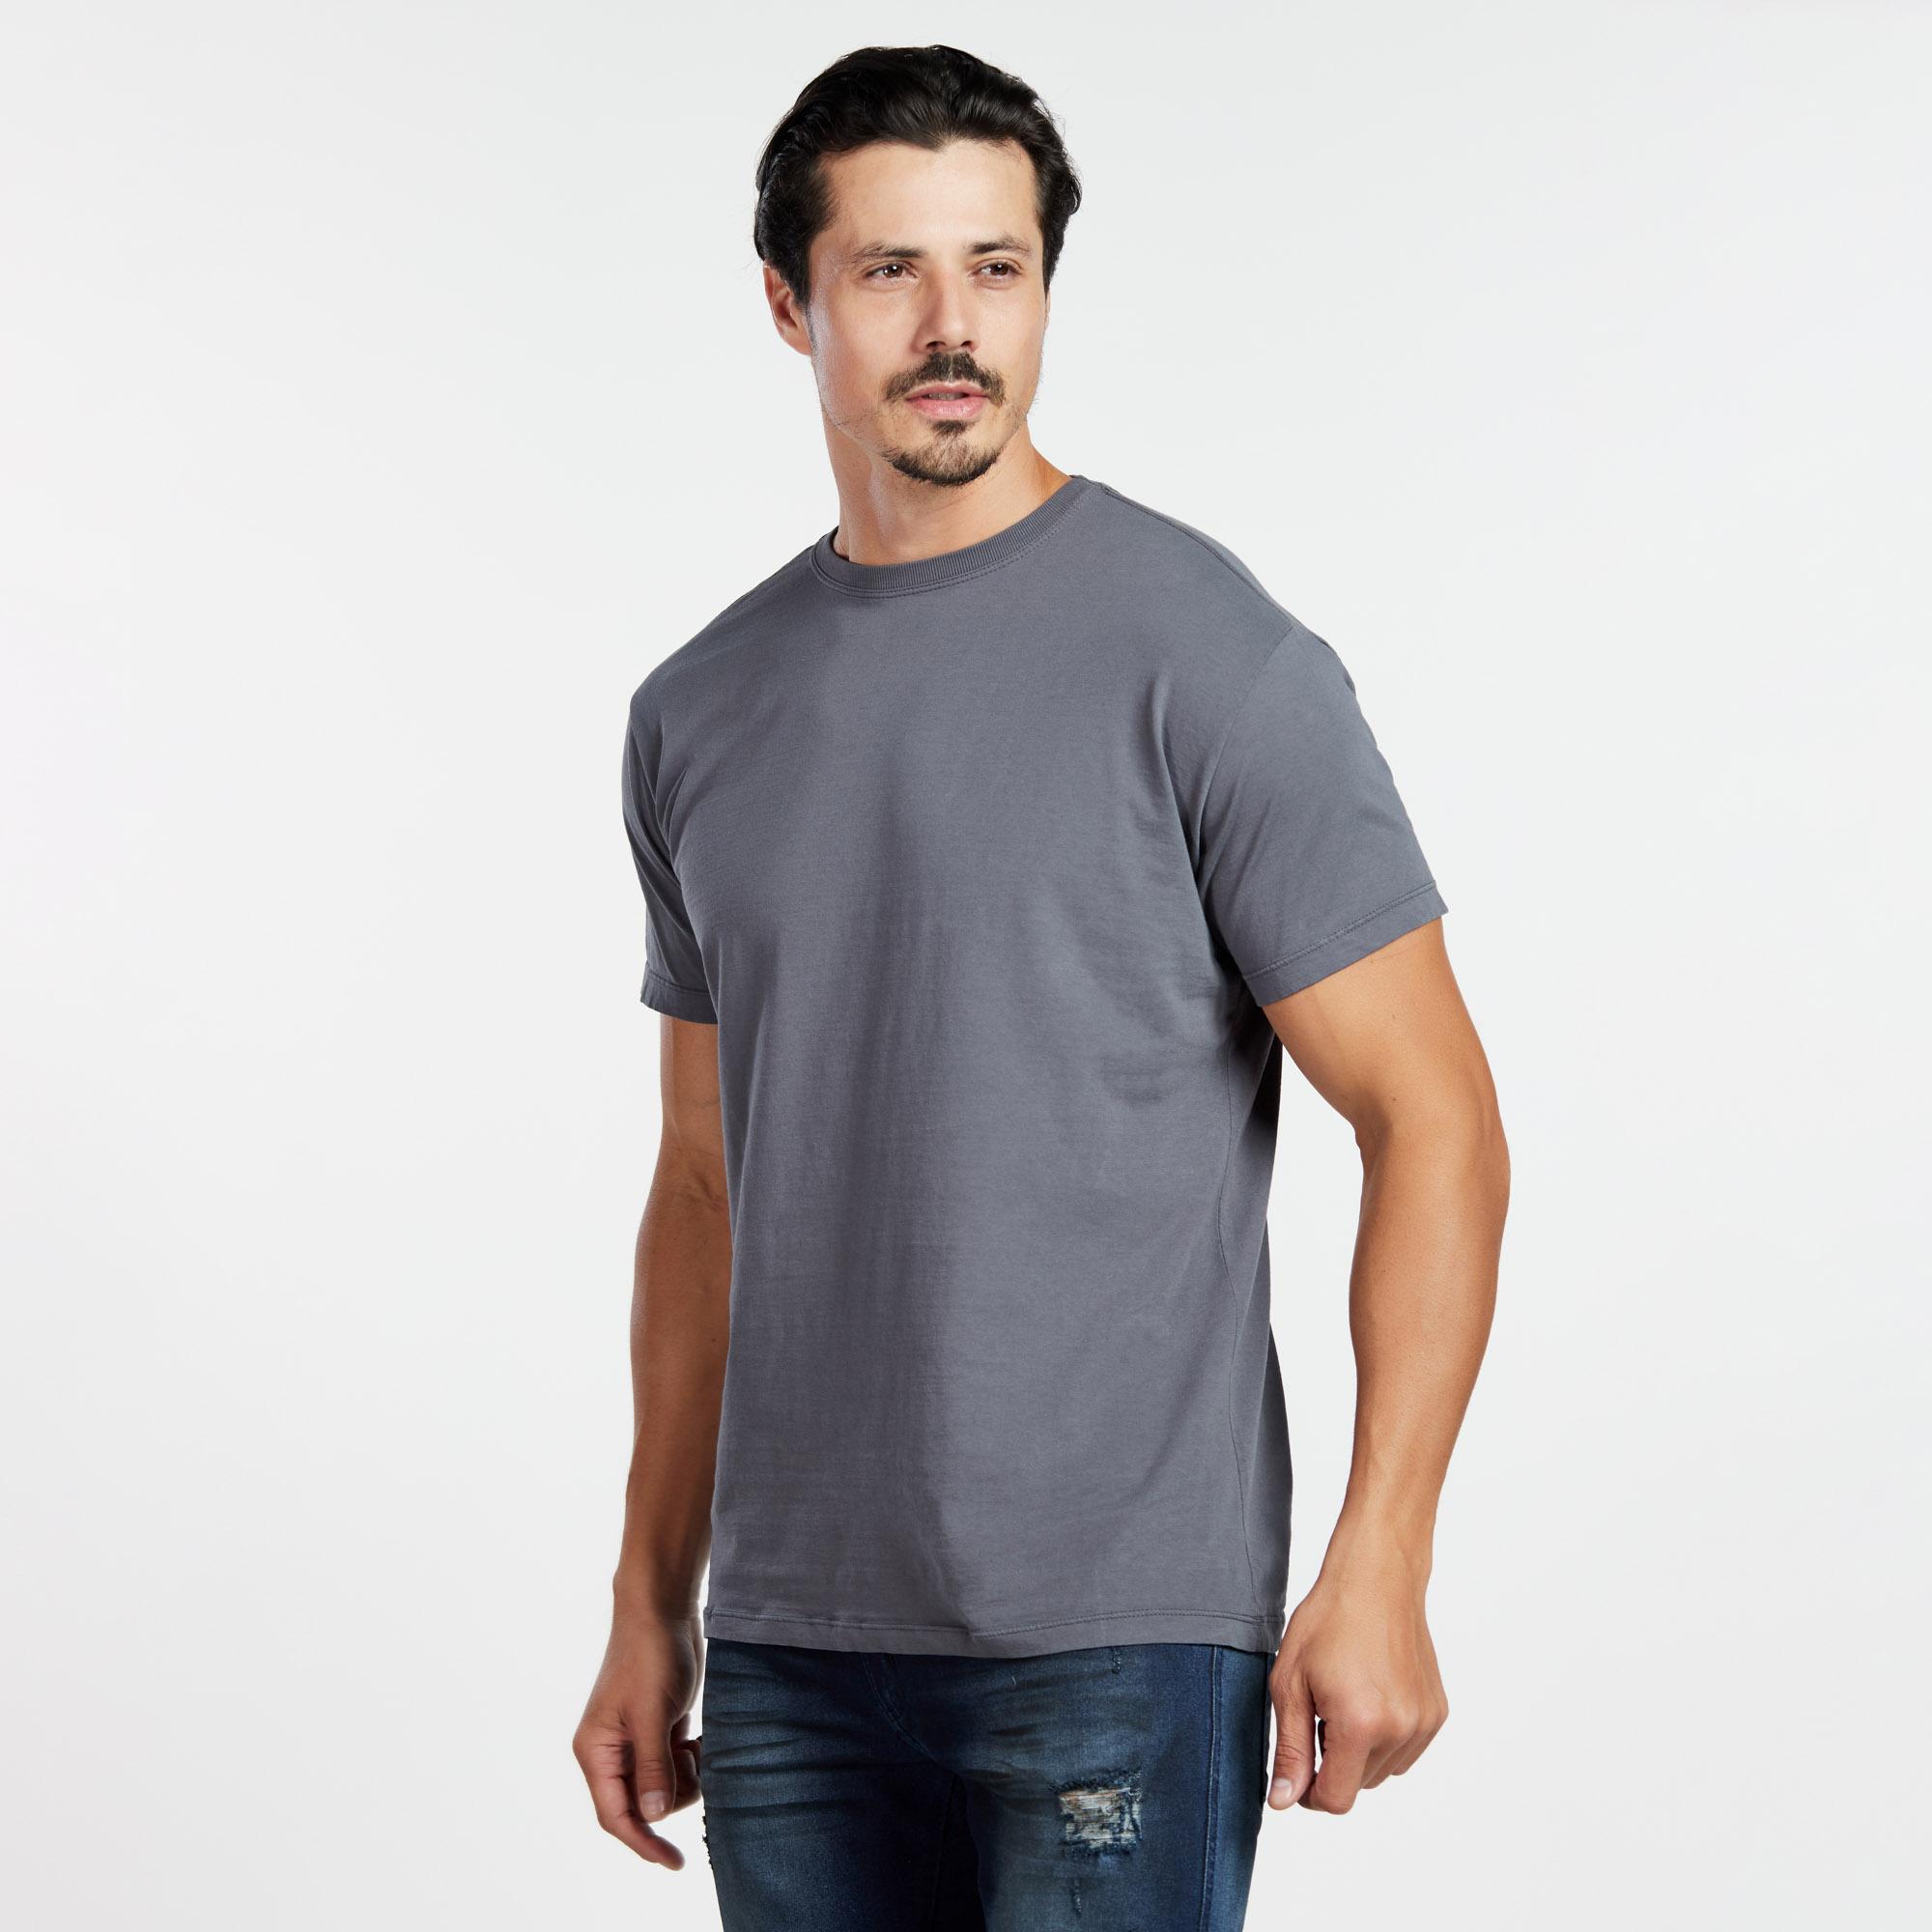 Camiseta Masculina Reativo Chumbo